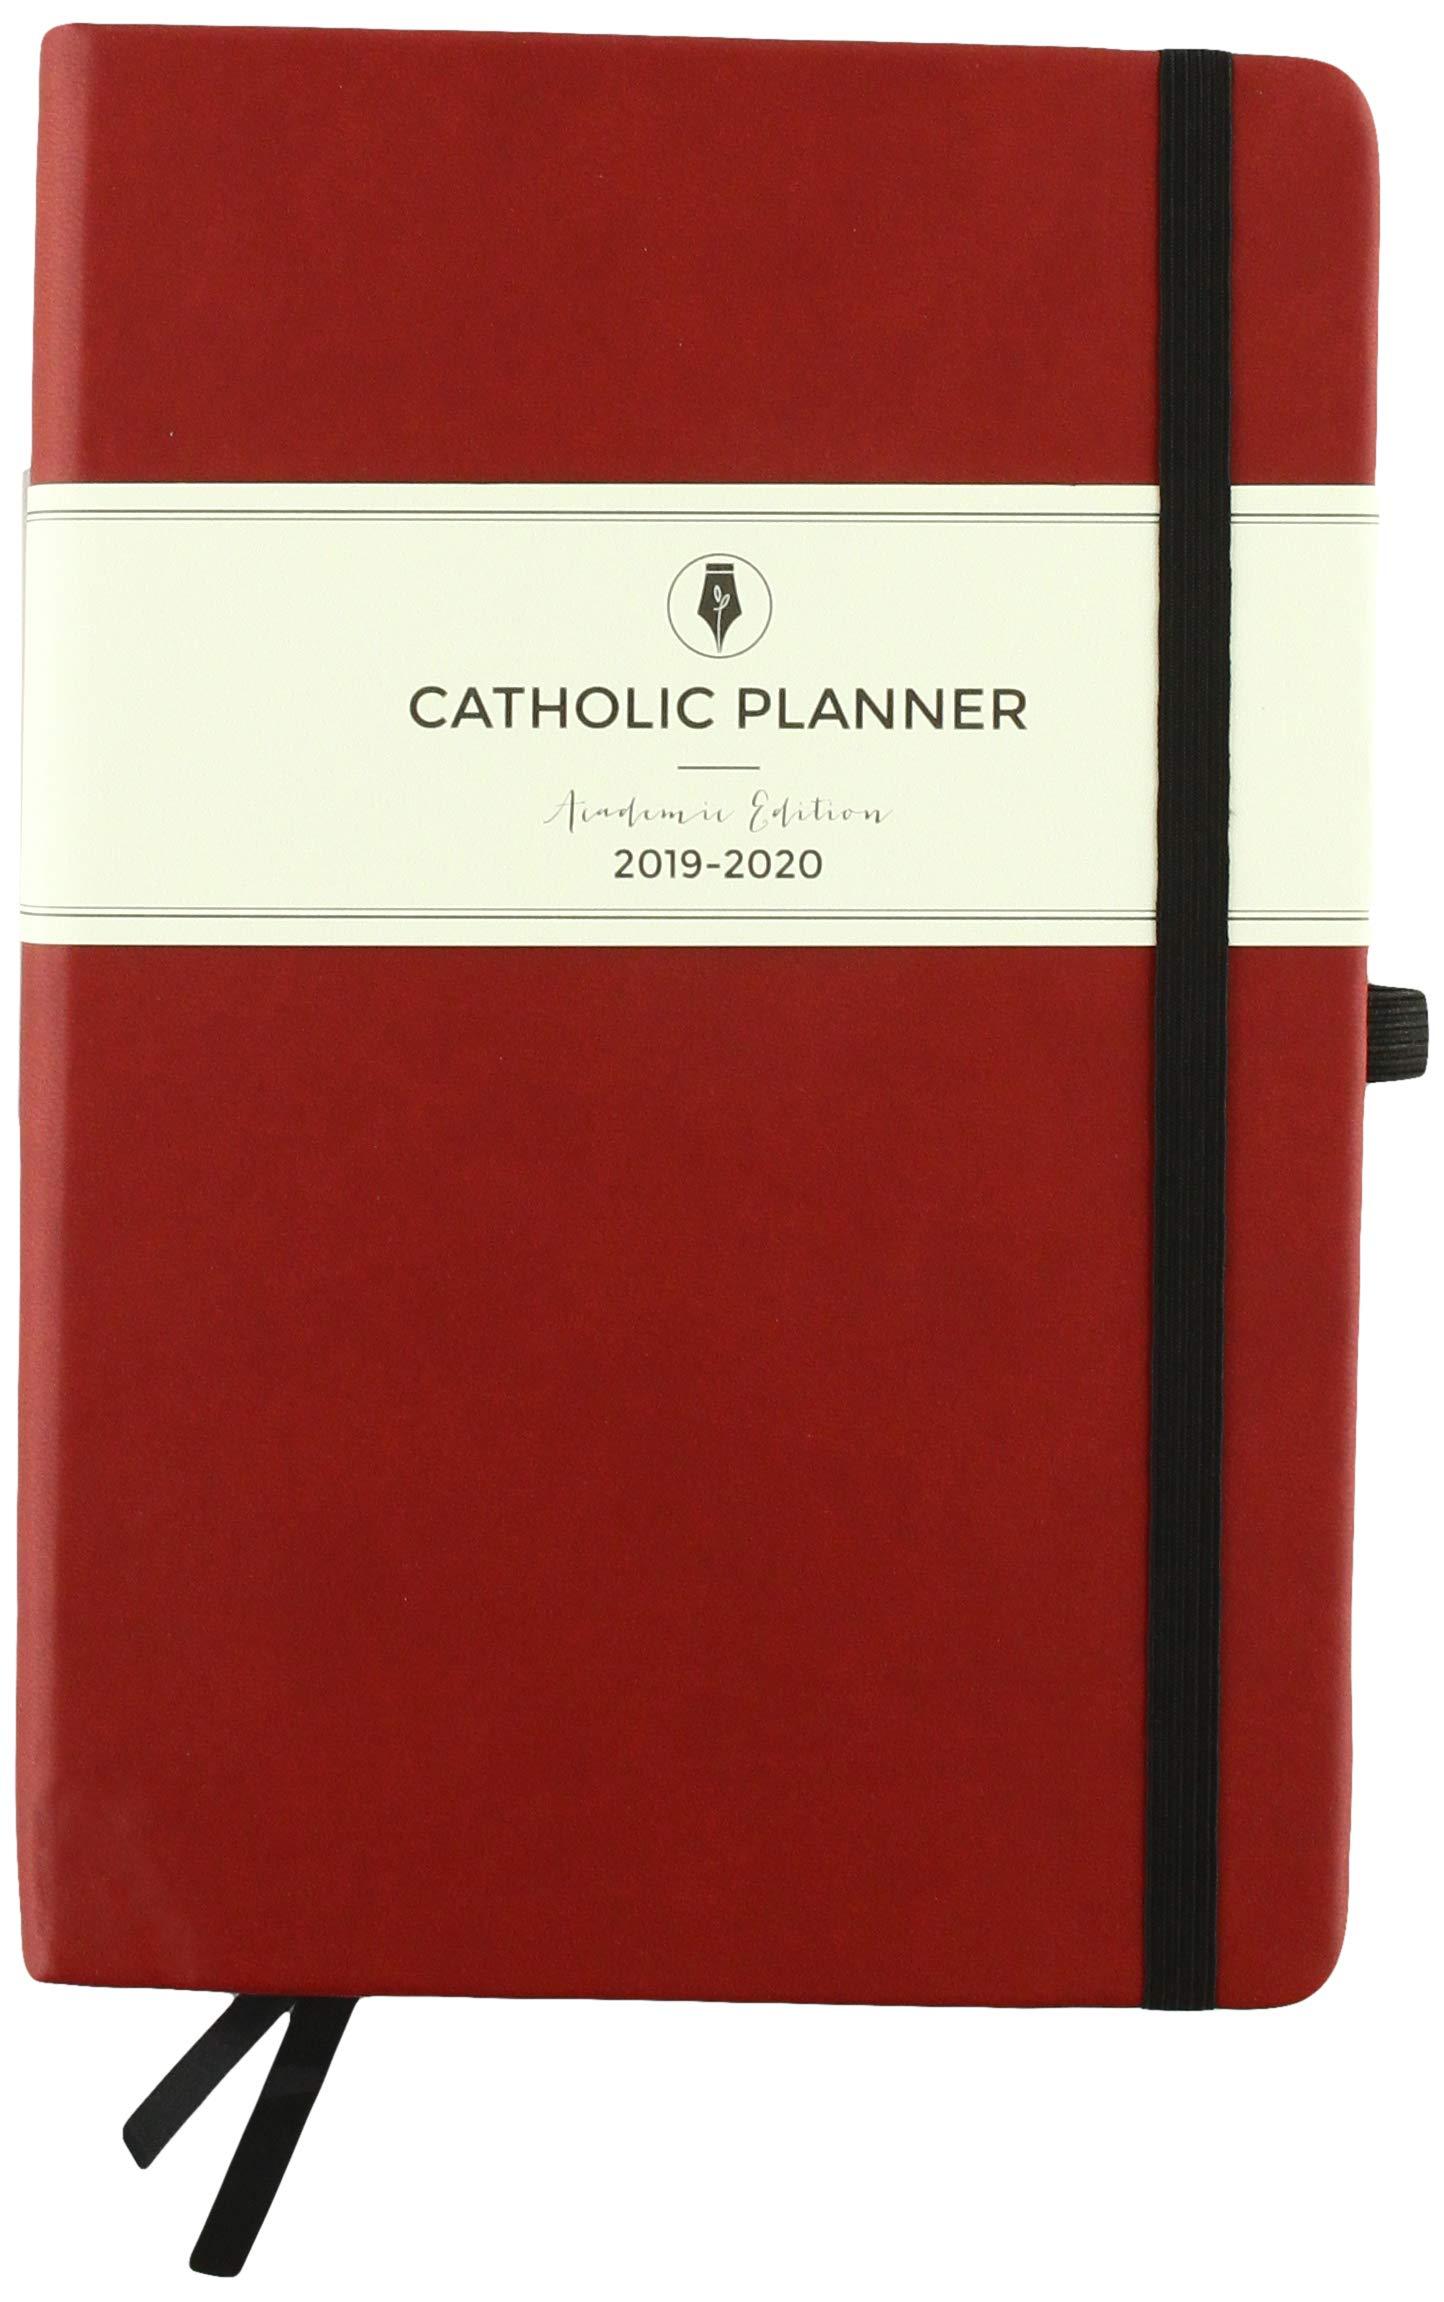 2014-2020 Liturgical Calendar 2019 2020 Catholic Planner Academic Edition: Wine, Compact